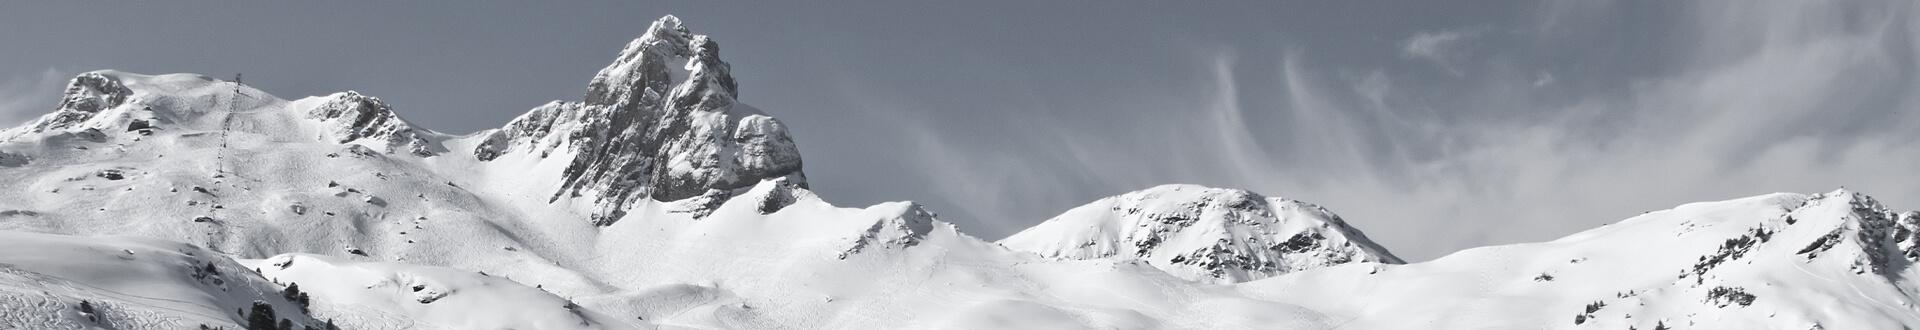 testata all mountain adeventure 1920x330 1